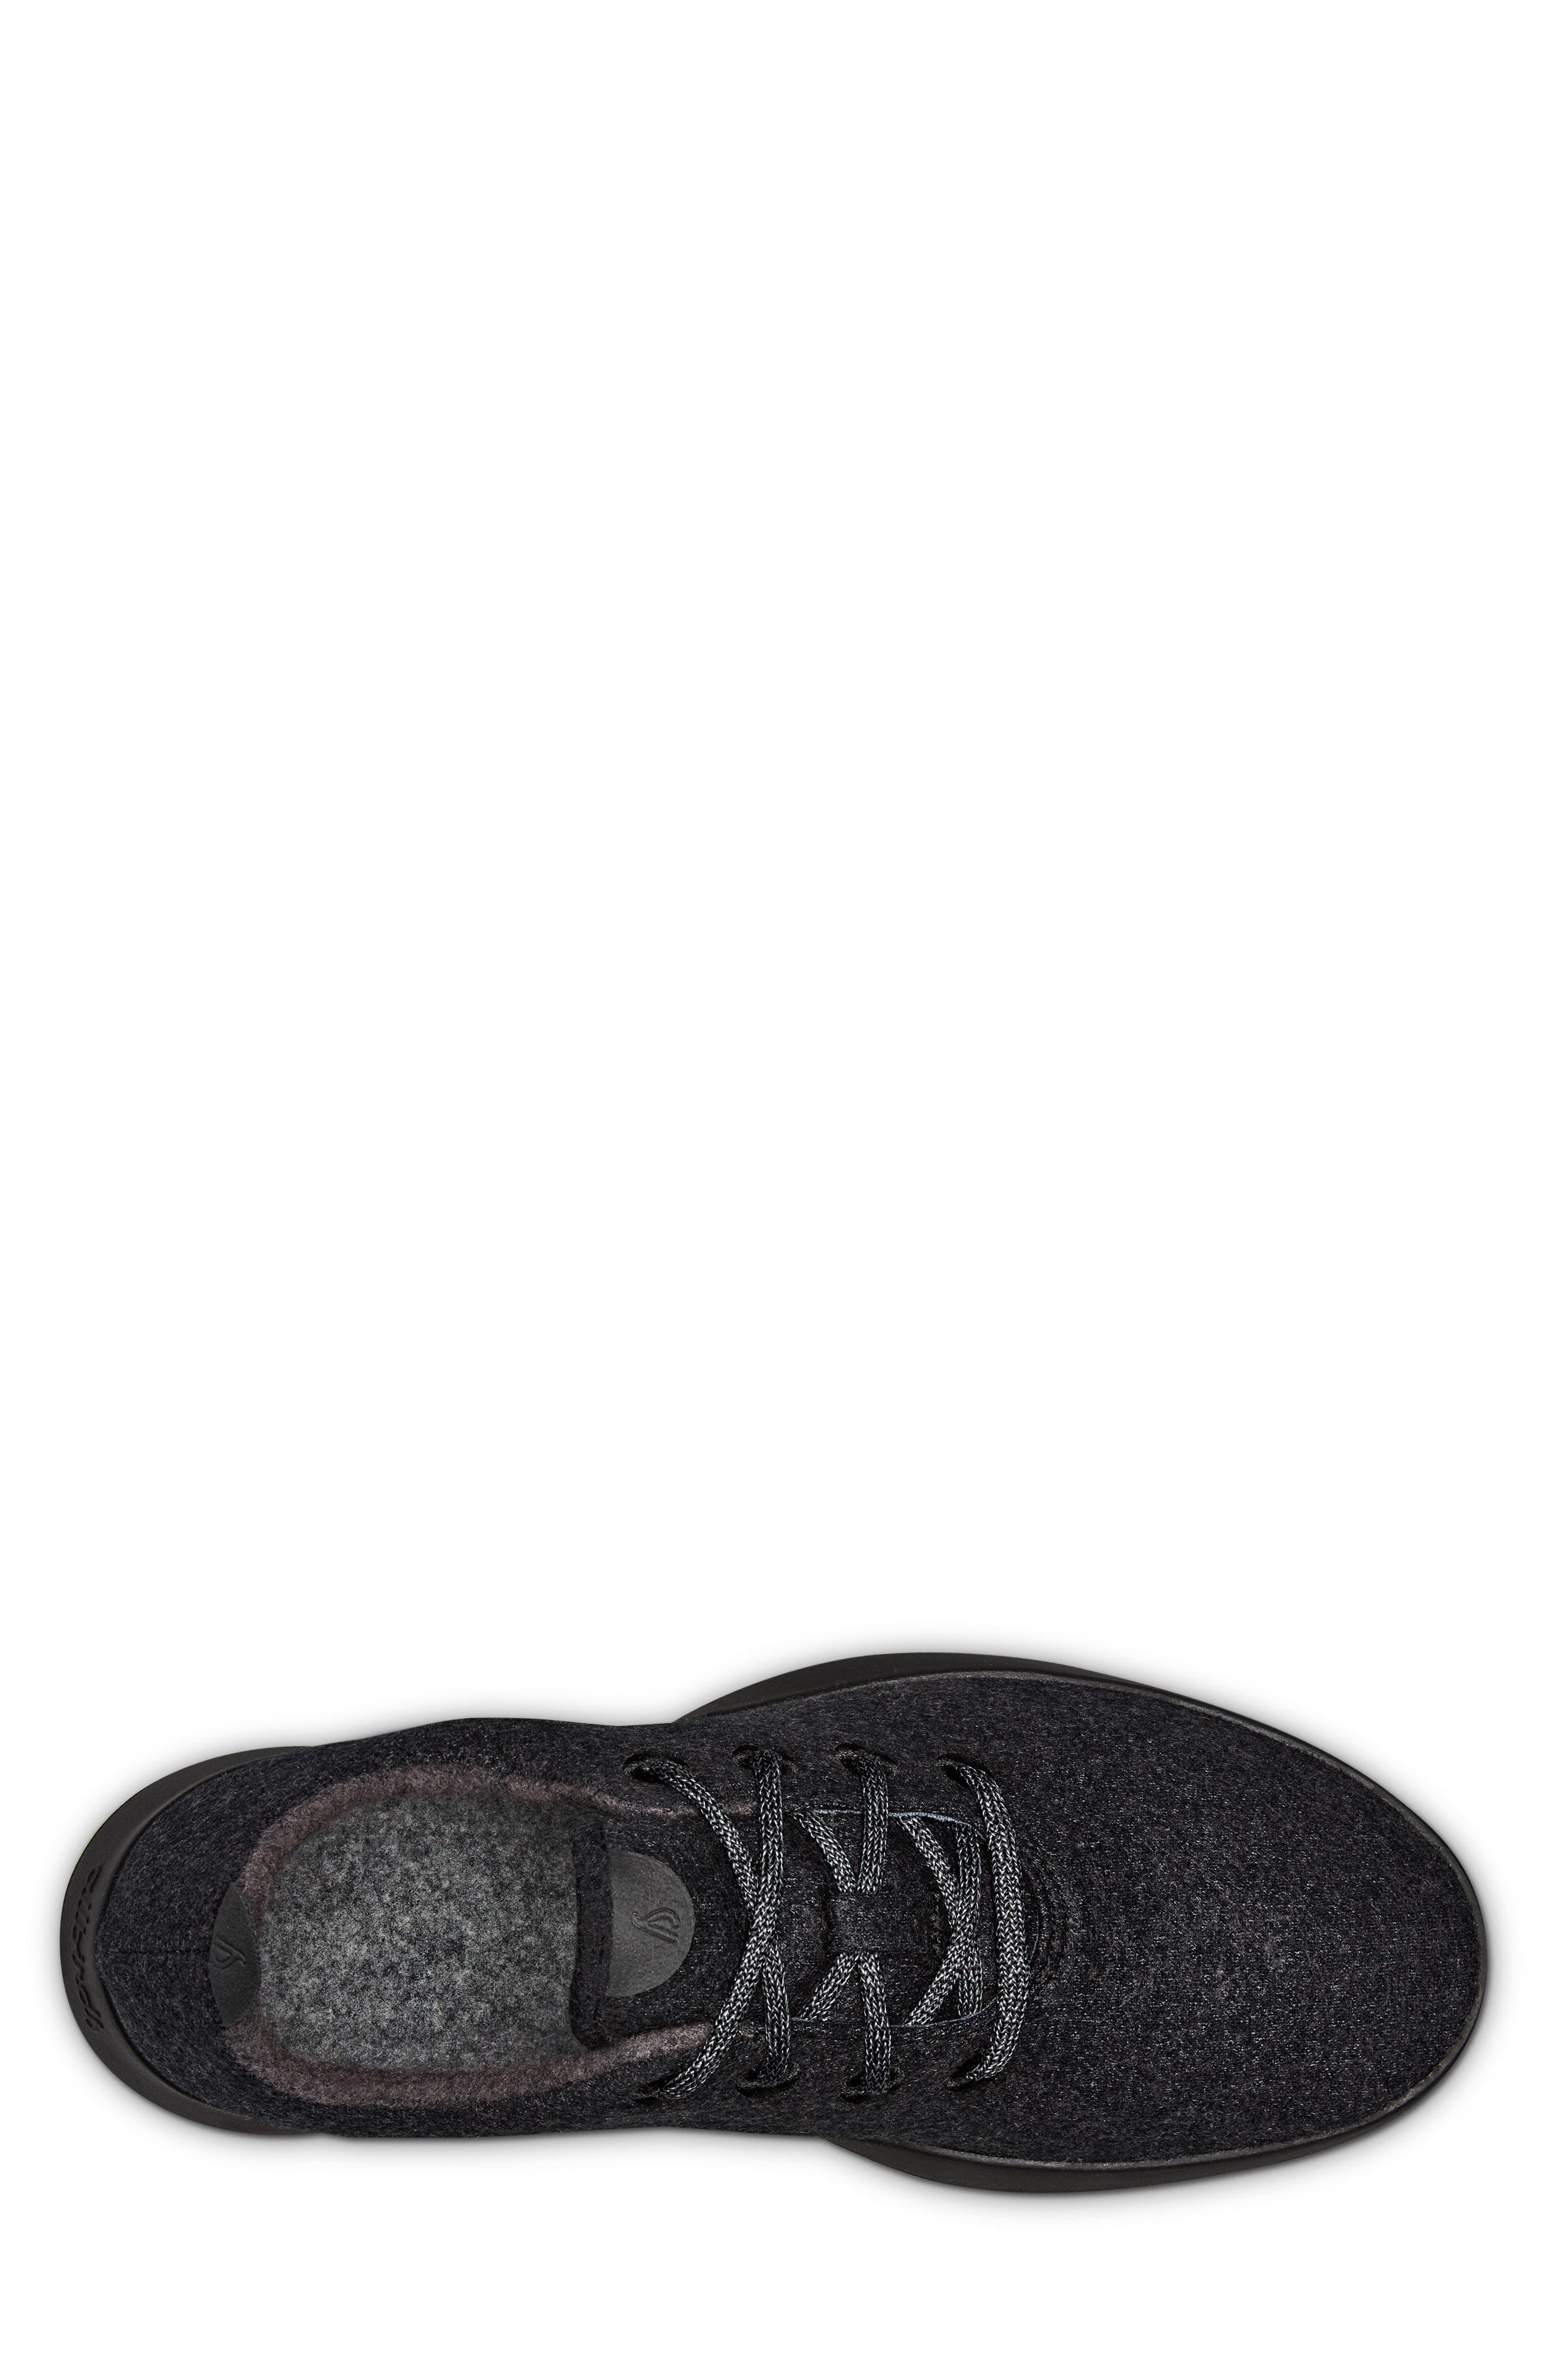 Wool Runner,                             Alternate thumbnail 4, color,                             Natural Black